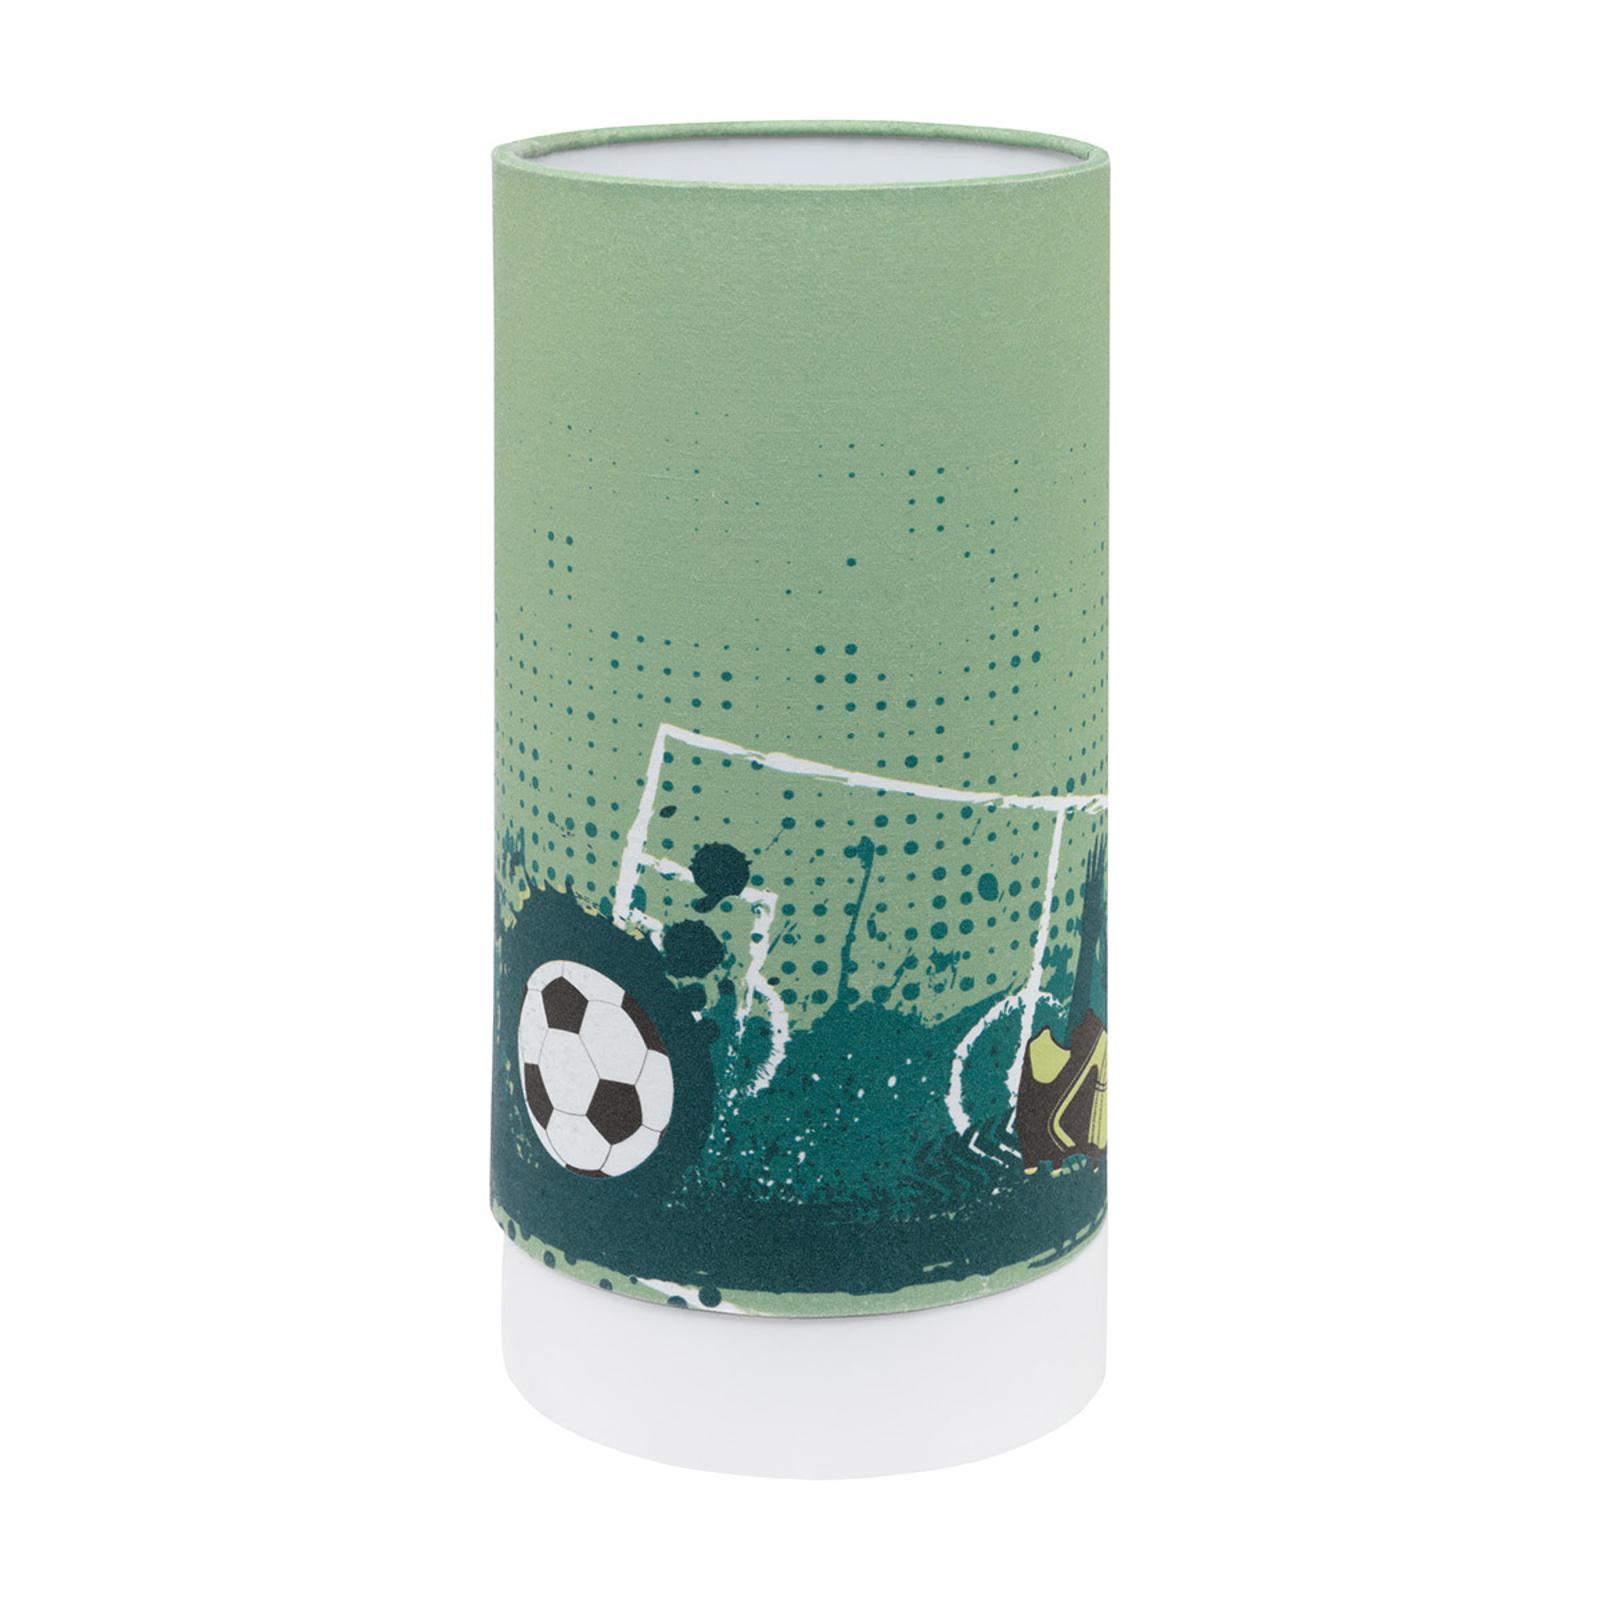 LED tafellamp Tabara met voetbalmotief